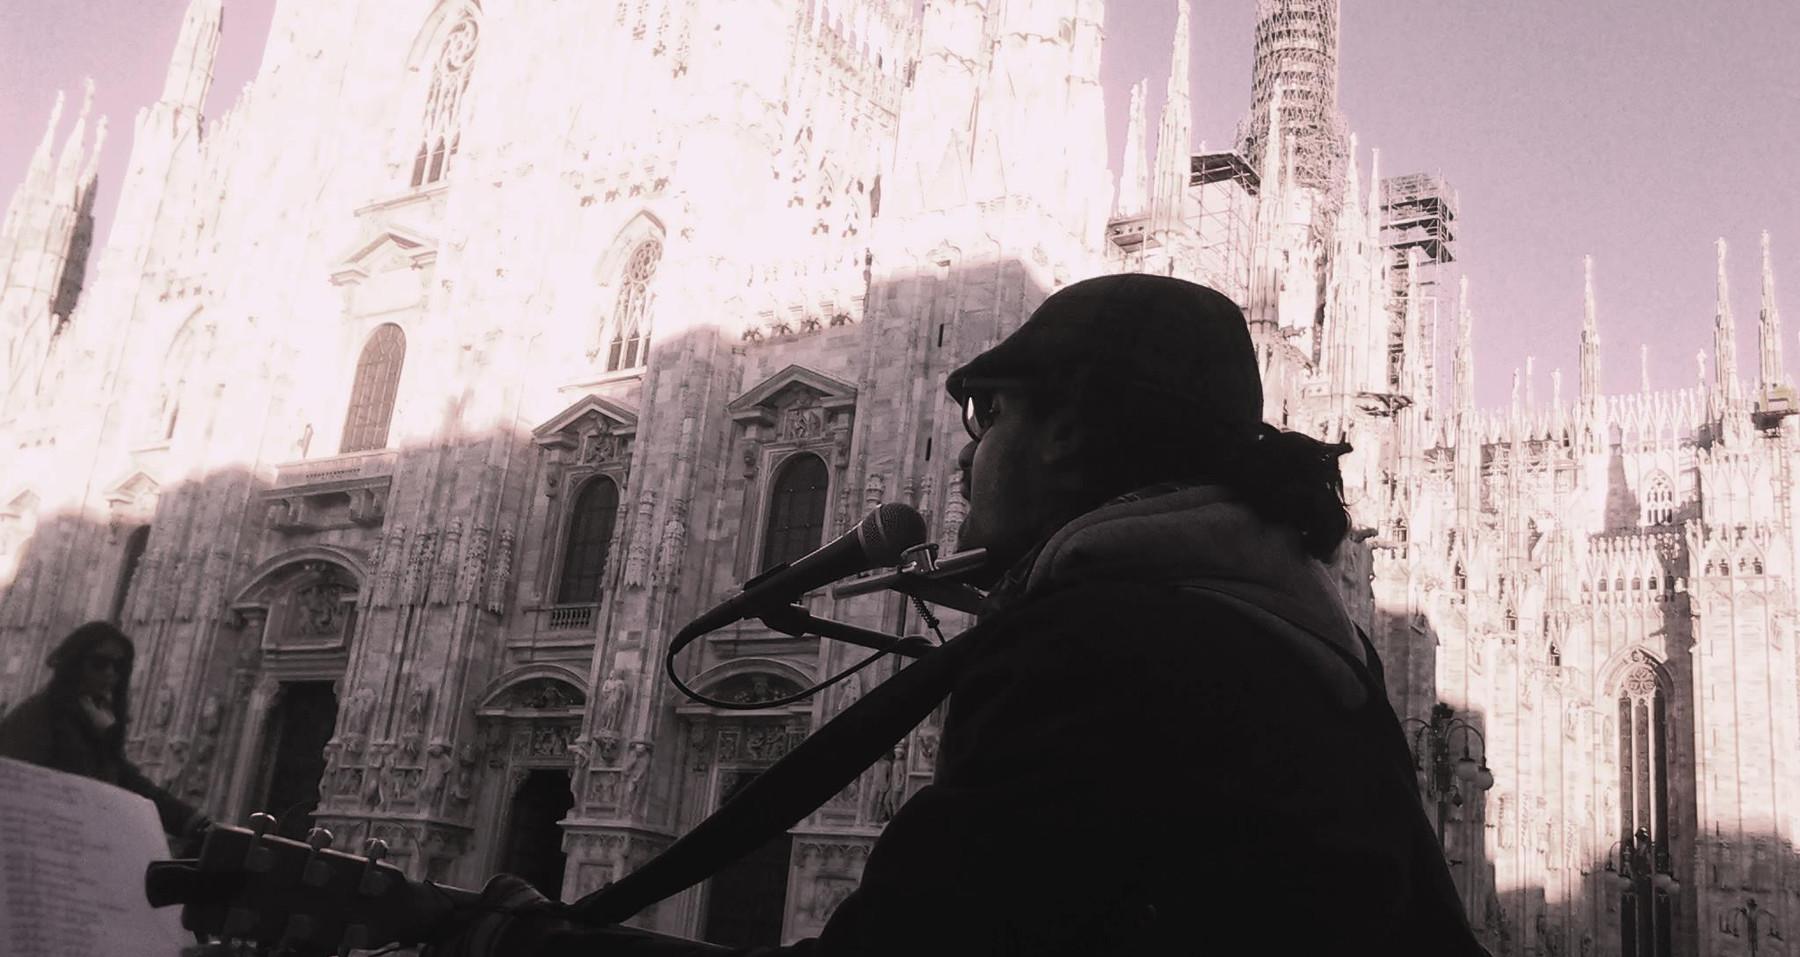 20121203_Duomo900_MI (10).jpg